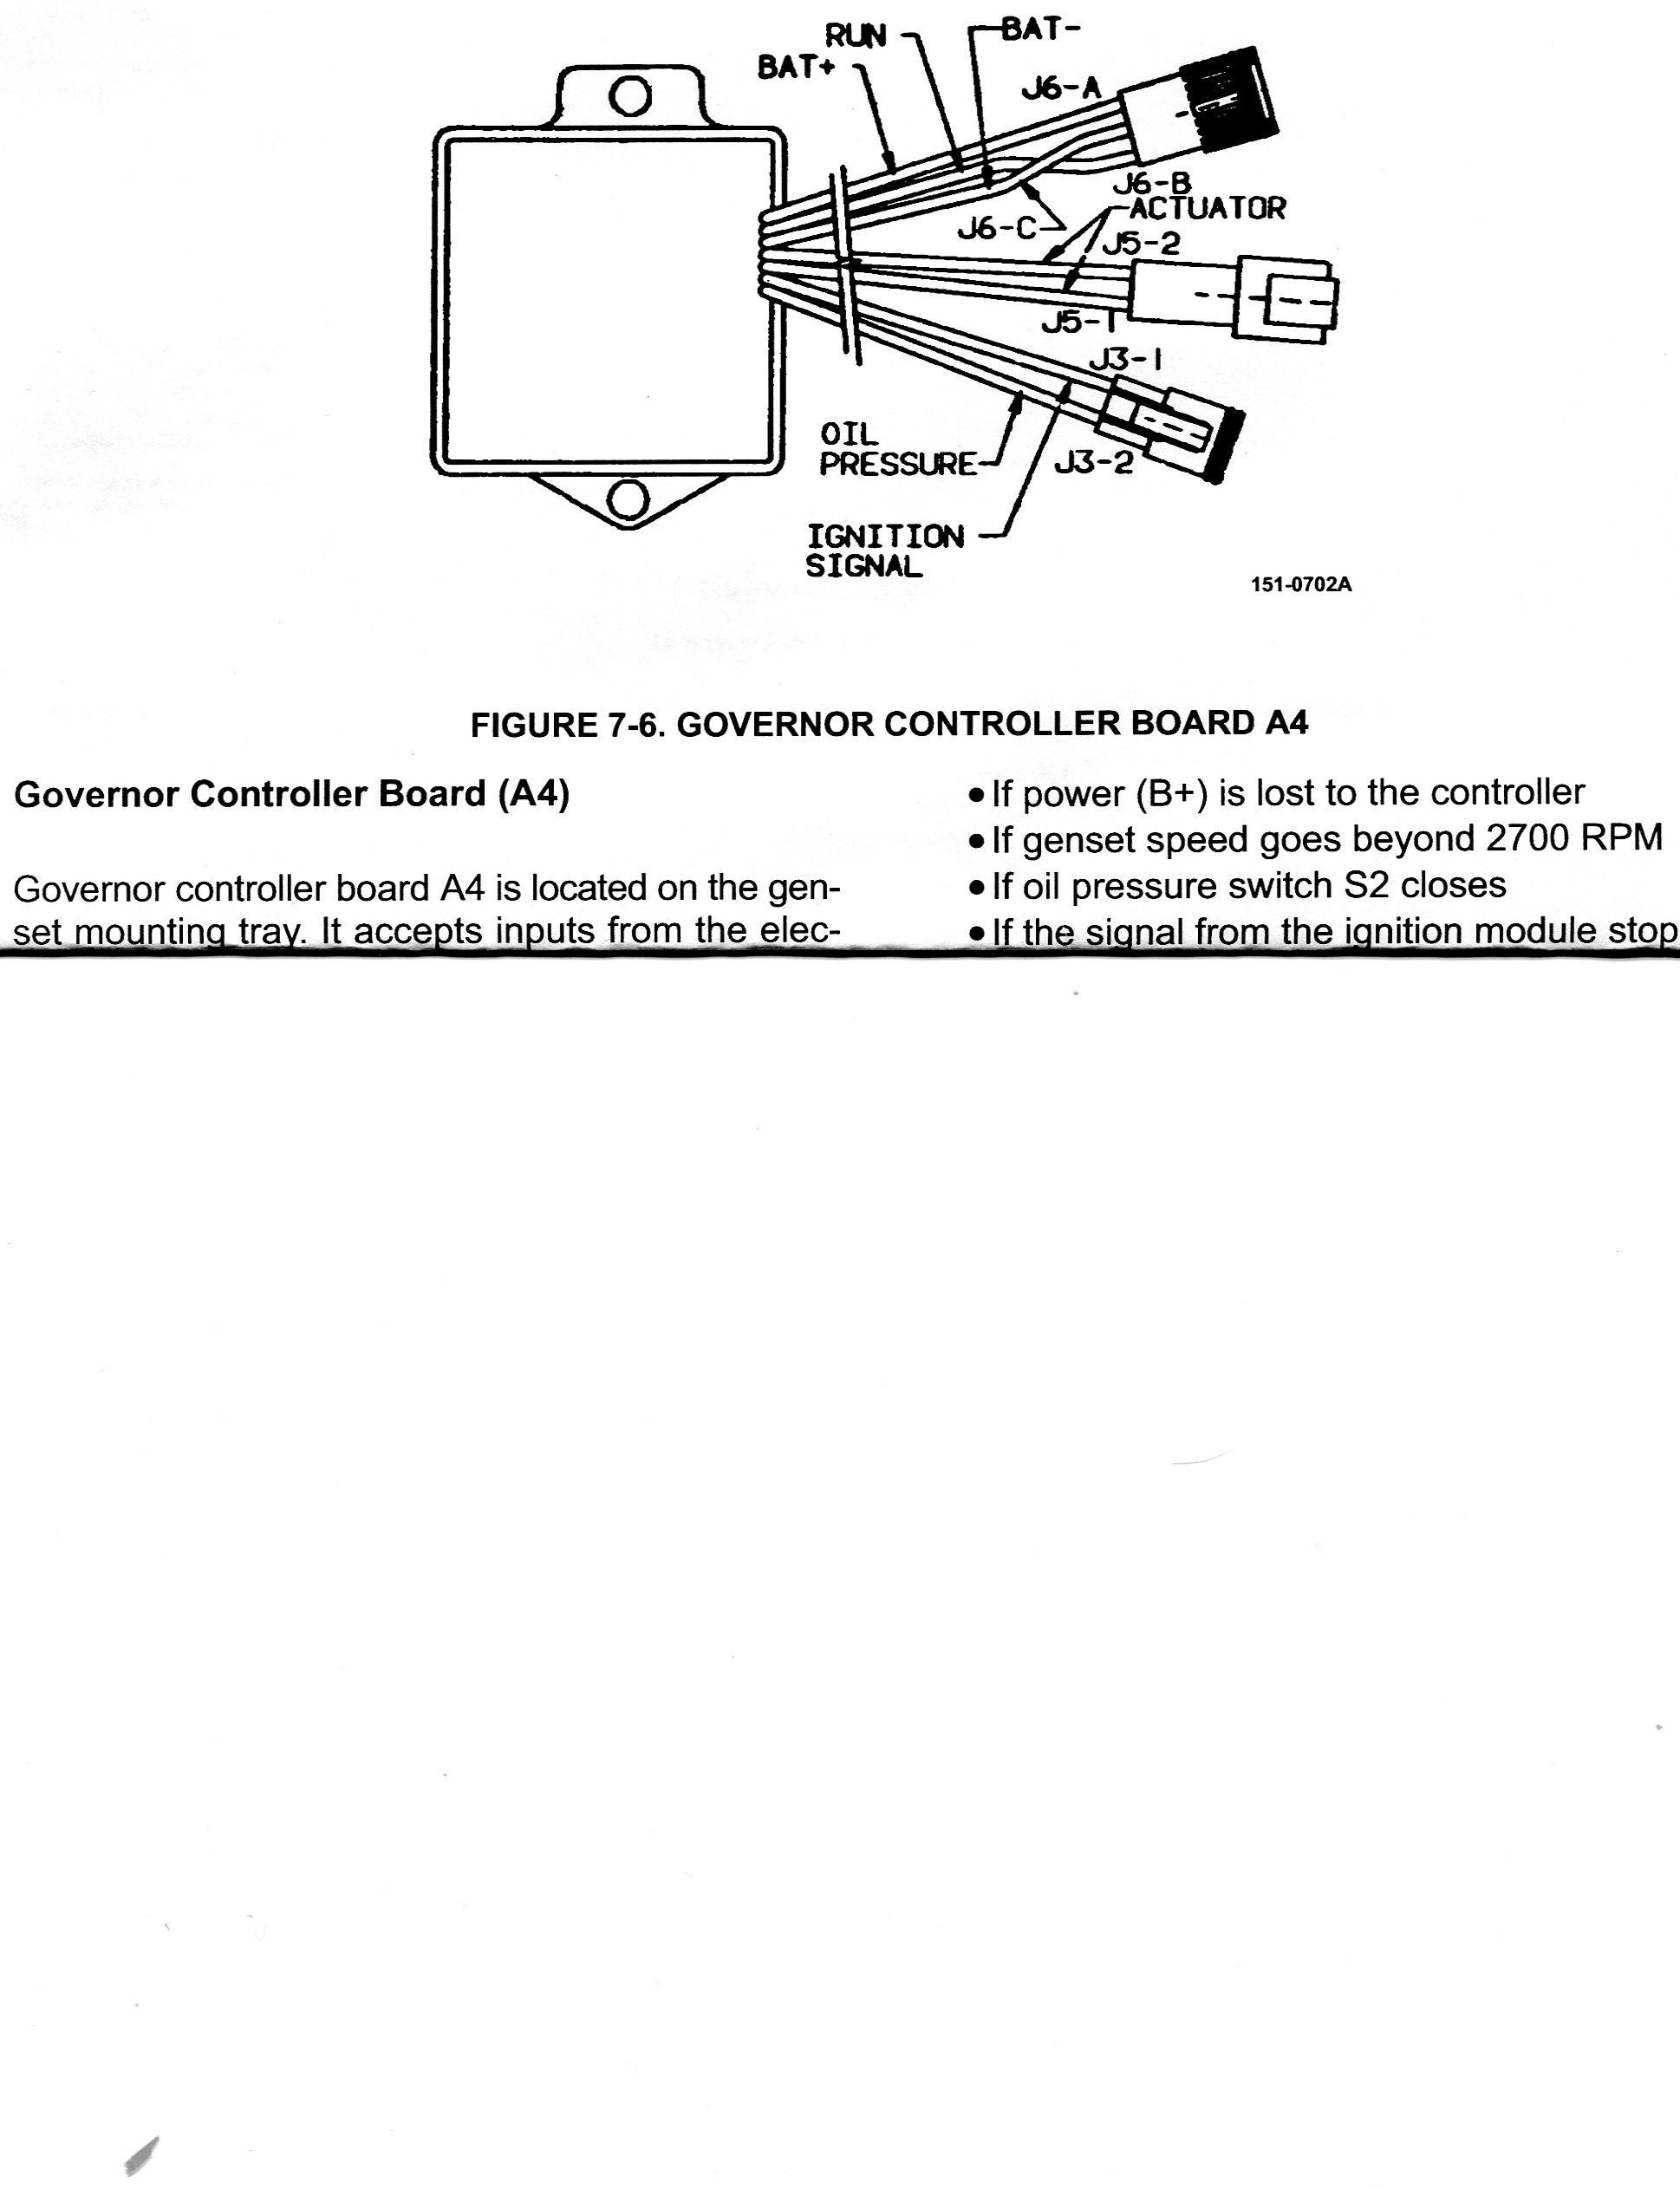 Awesome Onan 6500 Generator Wiring Diagram Frieze - Simple Wiring ...